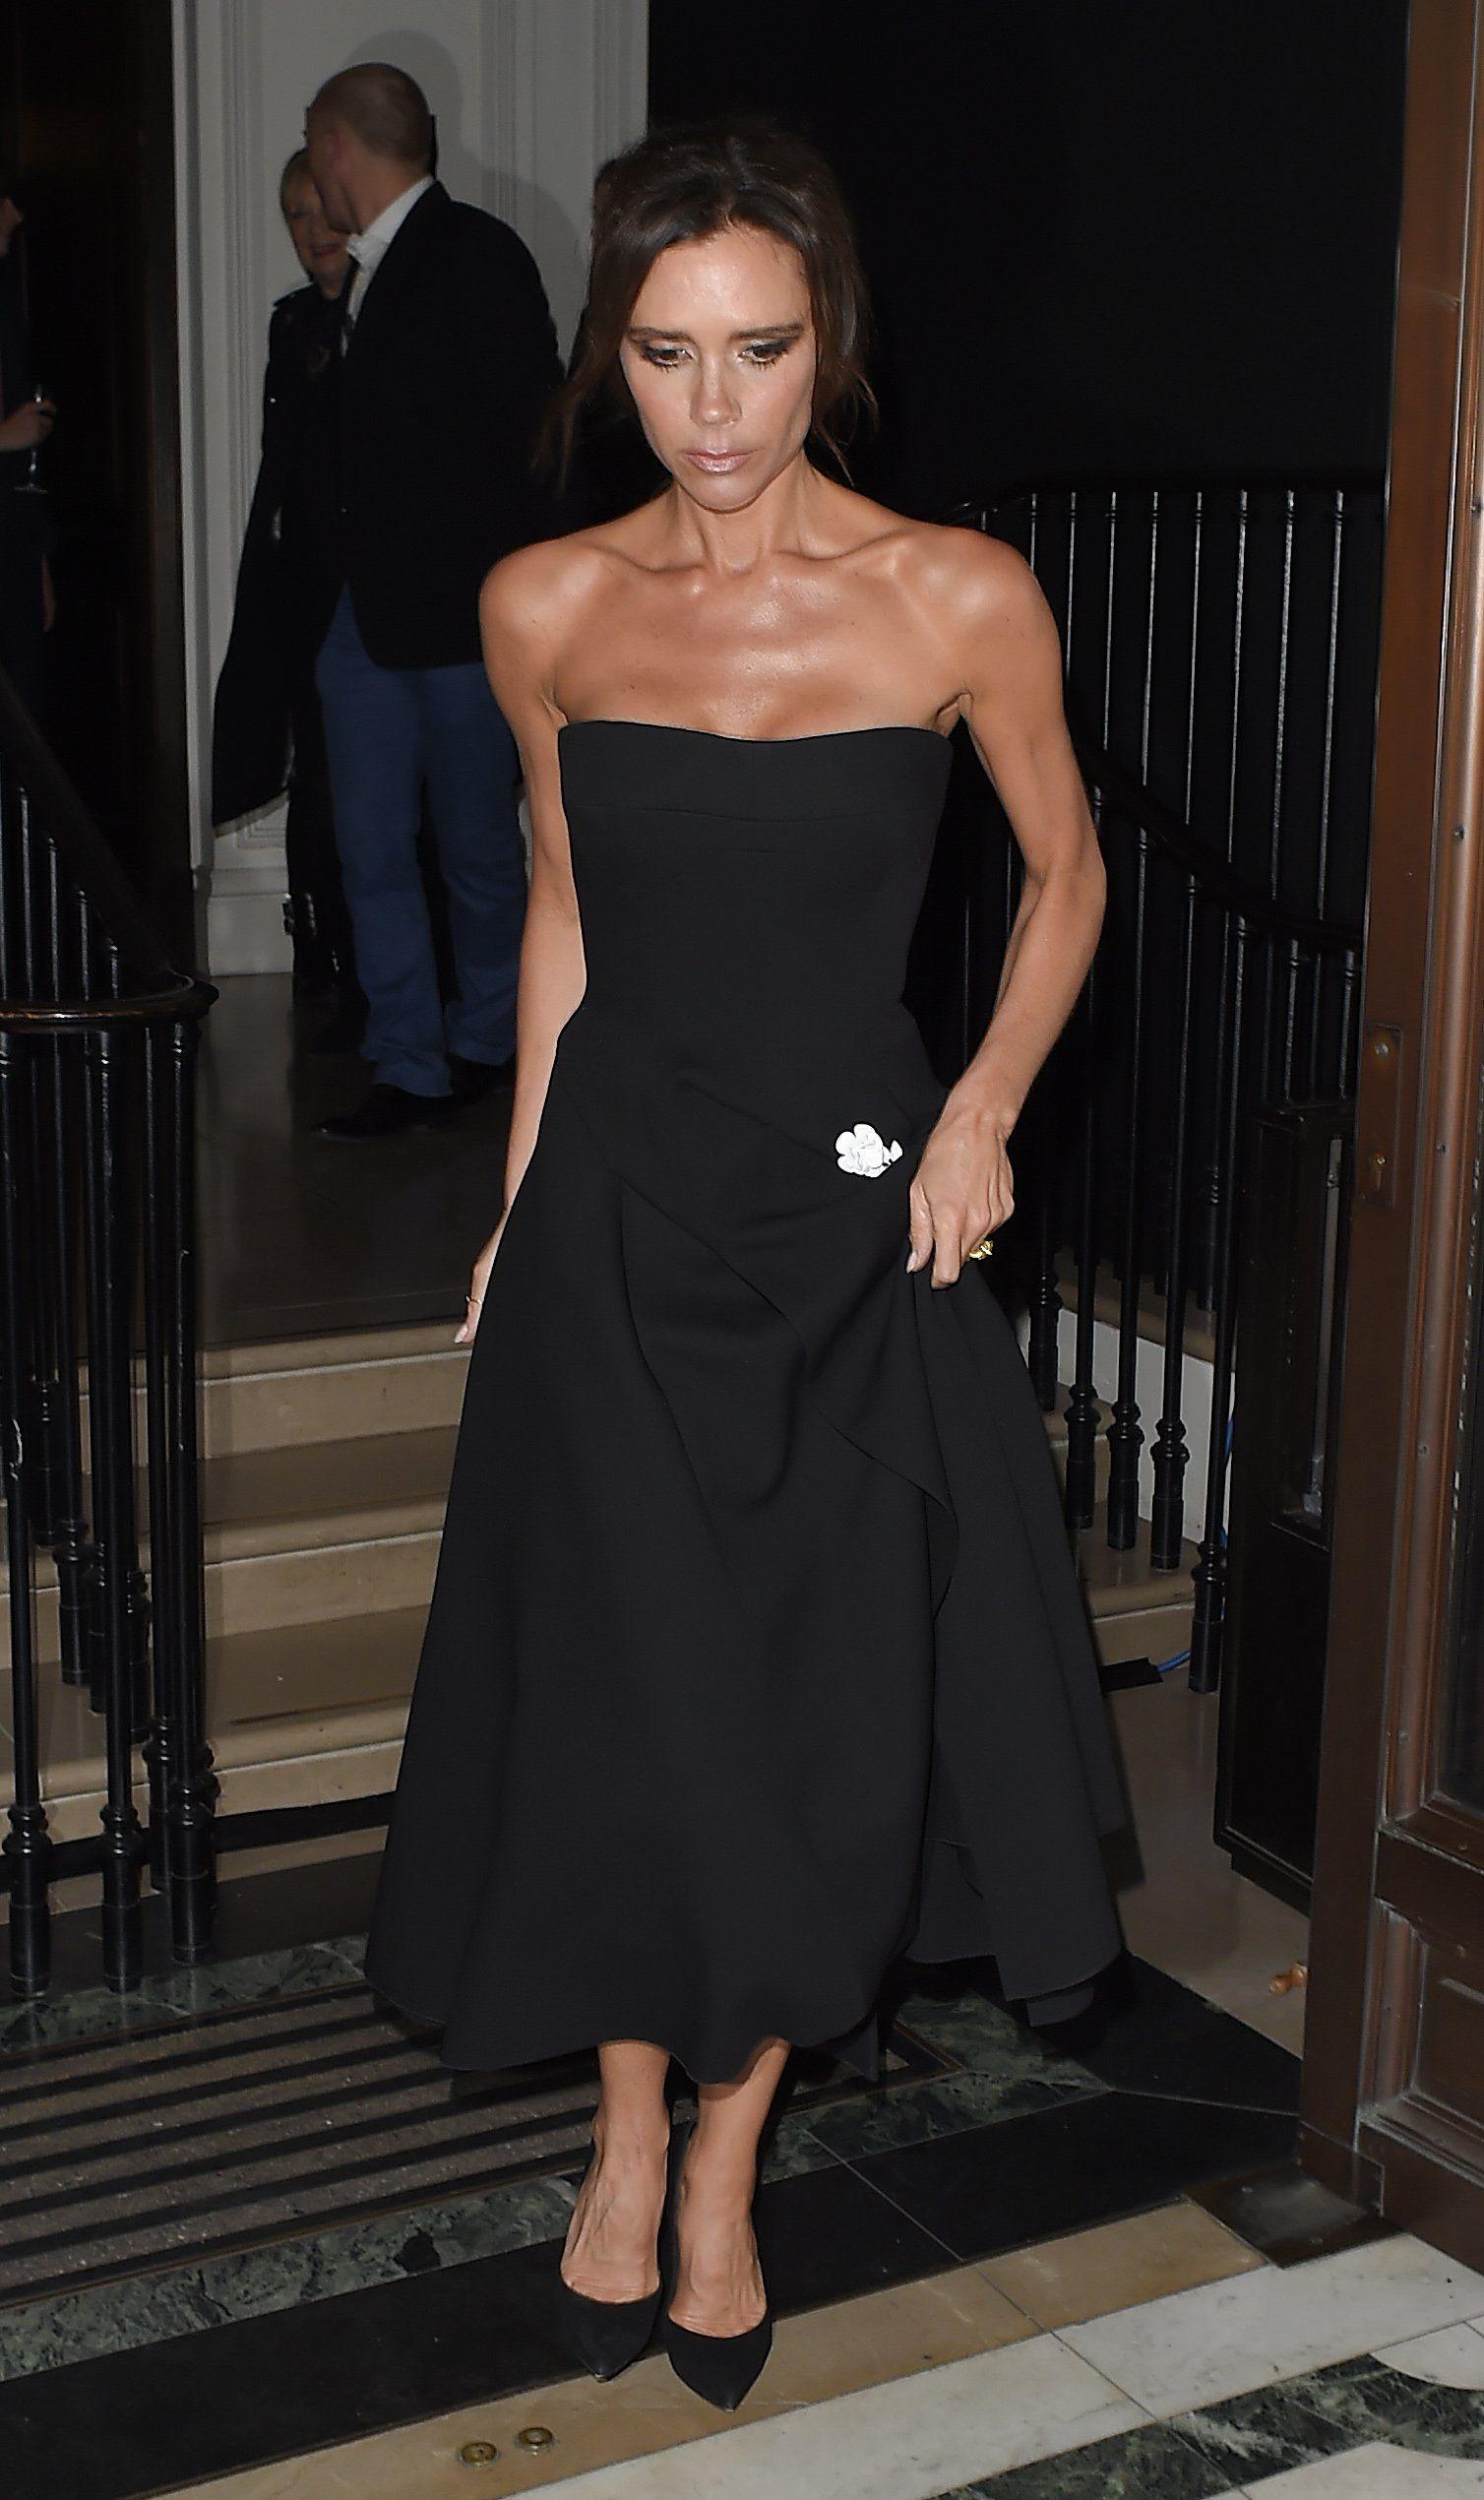 The Striking Transformation Of Victoria Beckham S Little Black Dress Strapless Dress Formal Dresses Black Dress [ 2540 x 1508 Pixel ]